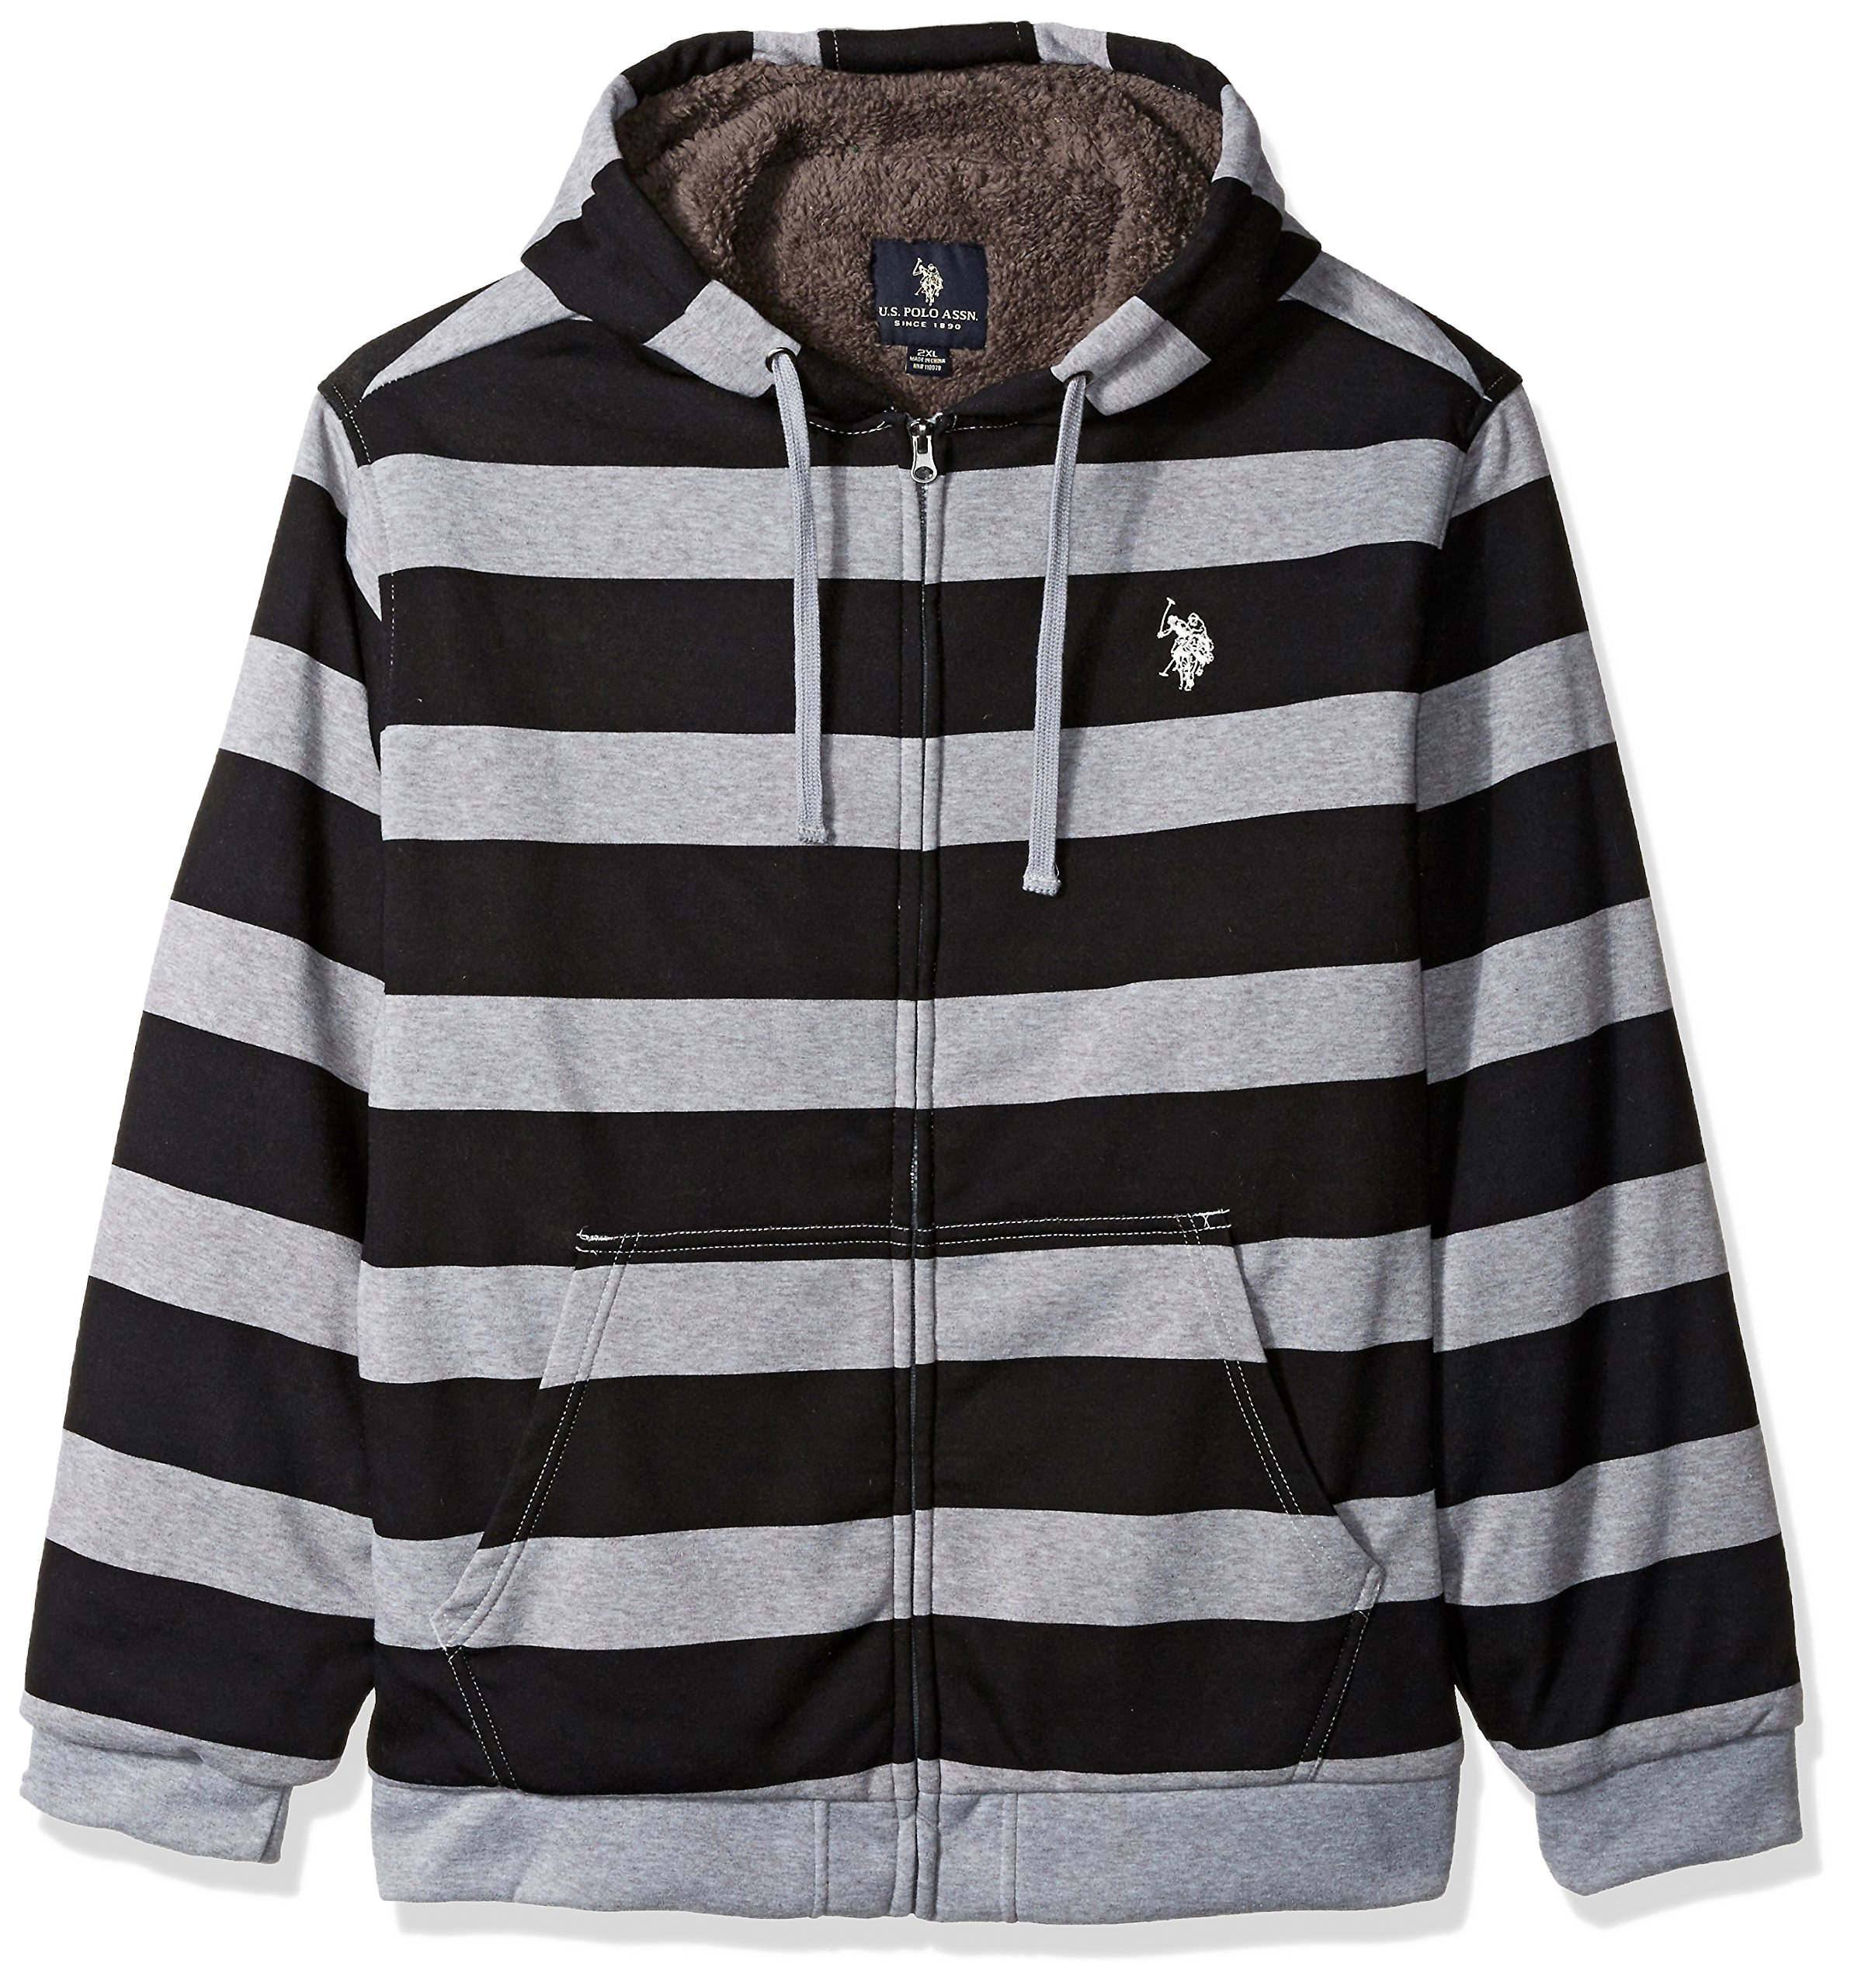 U.S. Polo Assn.. Mens Standard Colorblock Sherpa Lined Fleece Hoodie, Black 5517, 2X